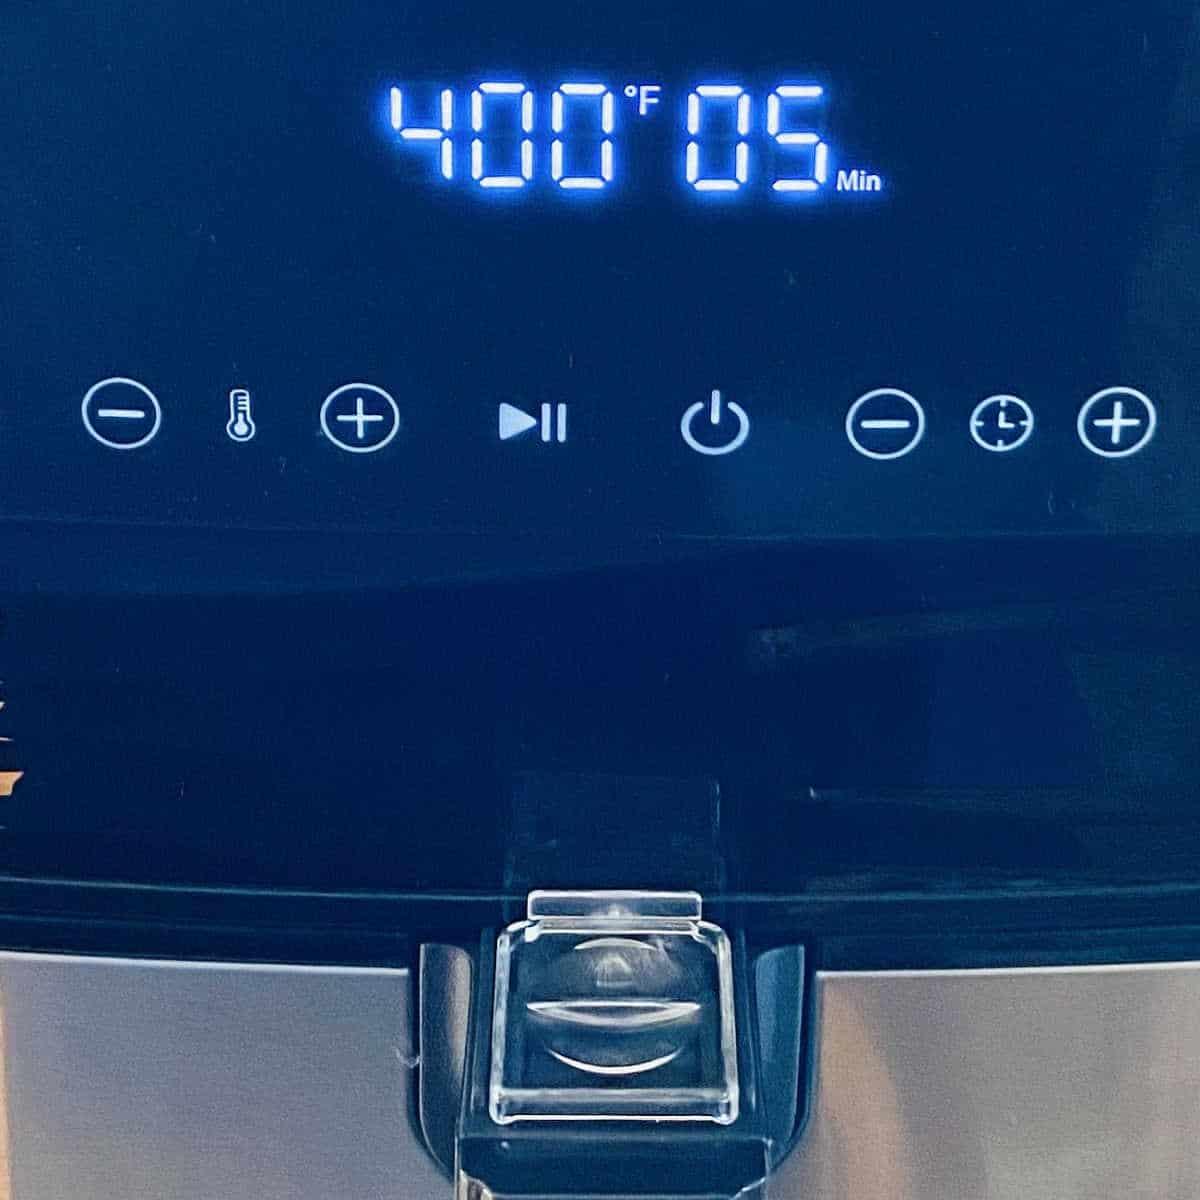 front of air fryer showing preheat temperature gauge